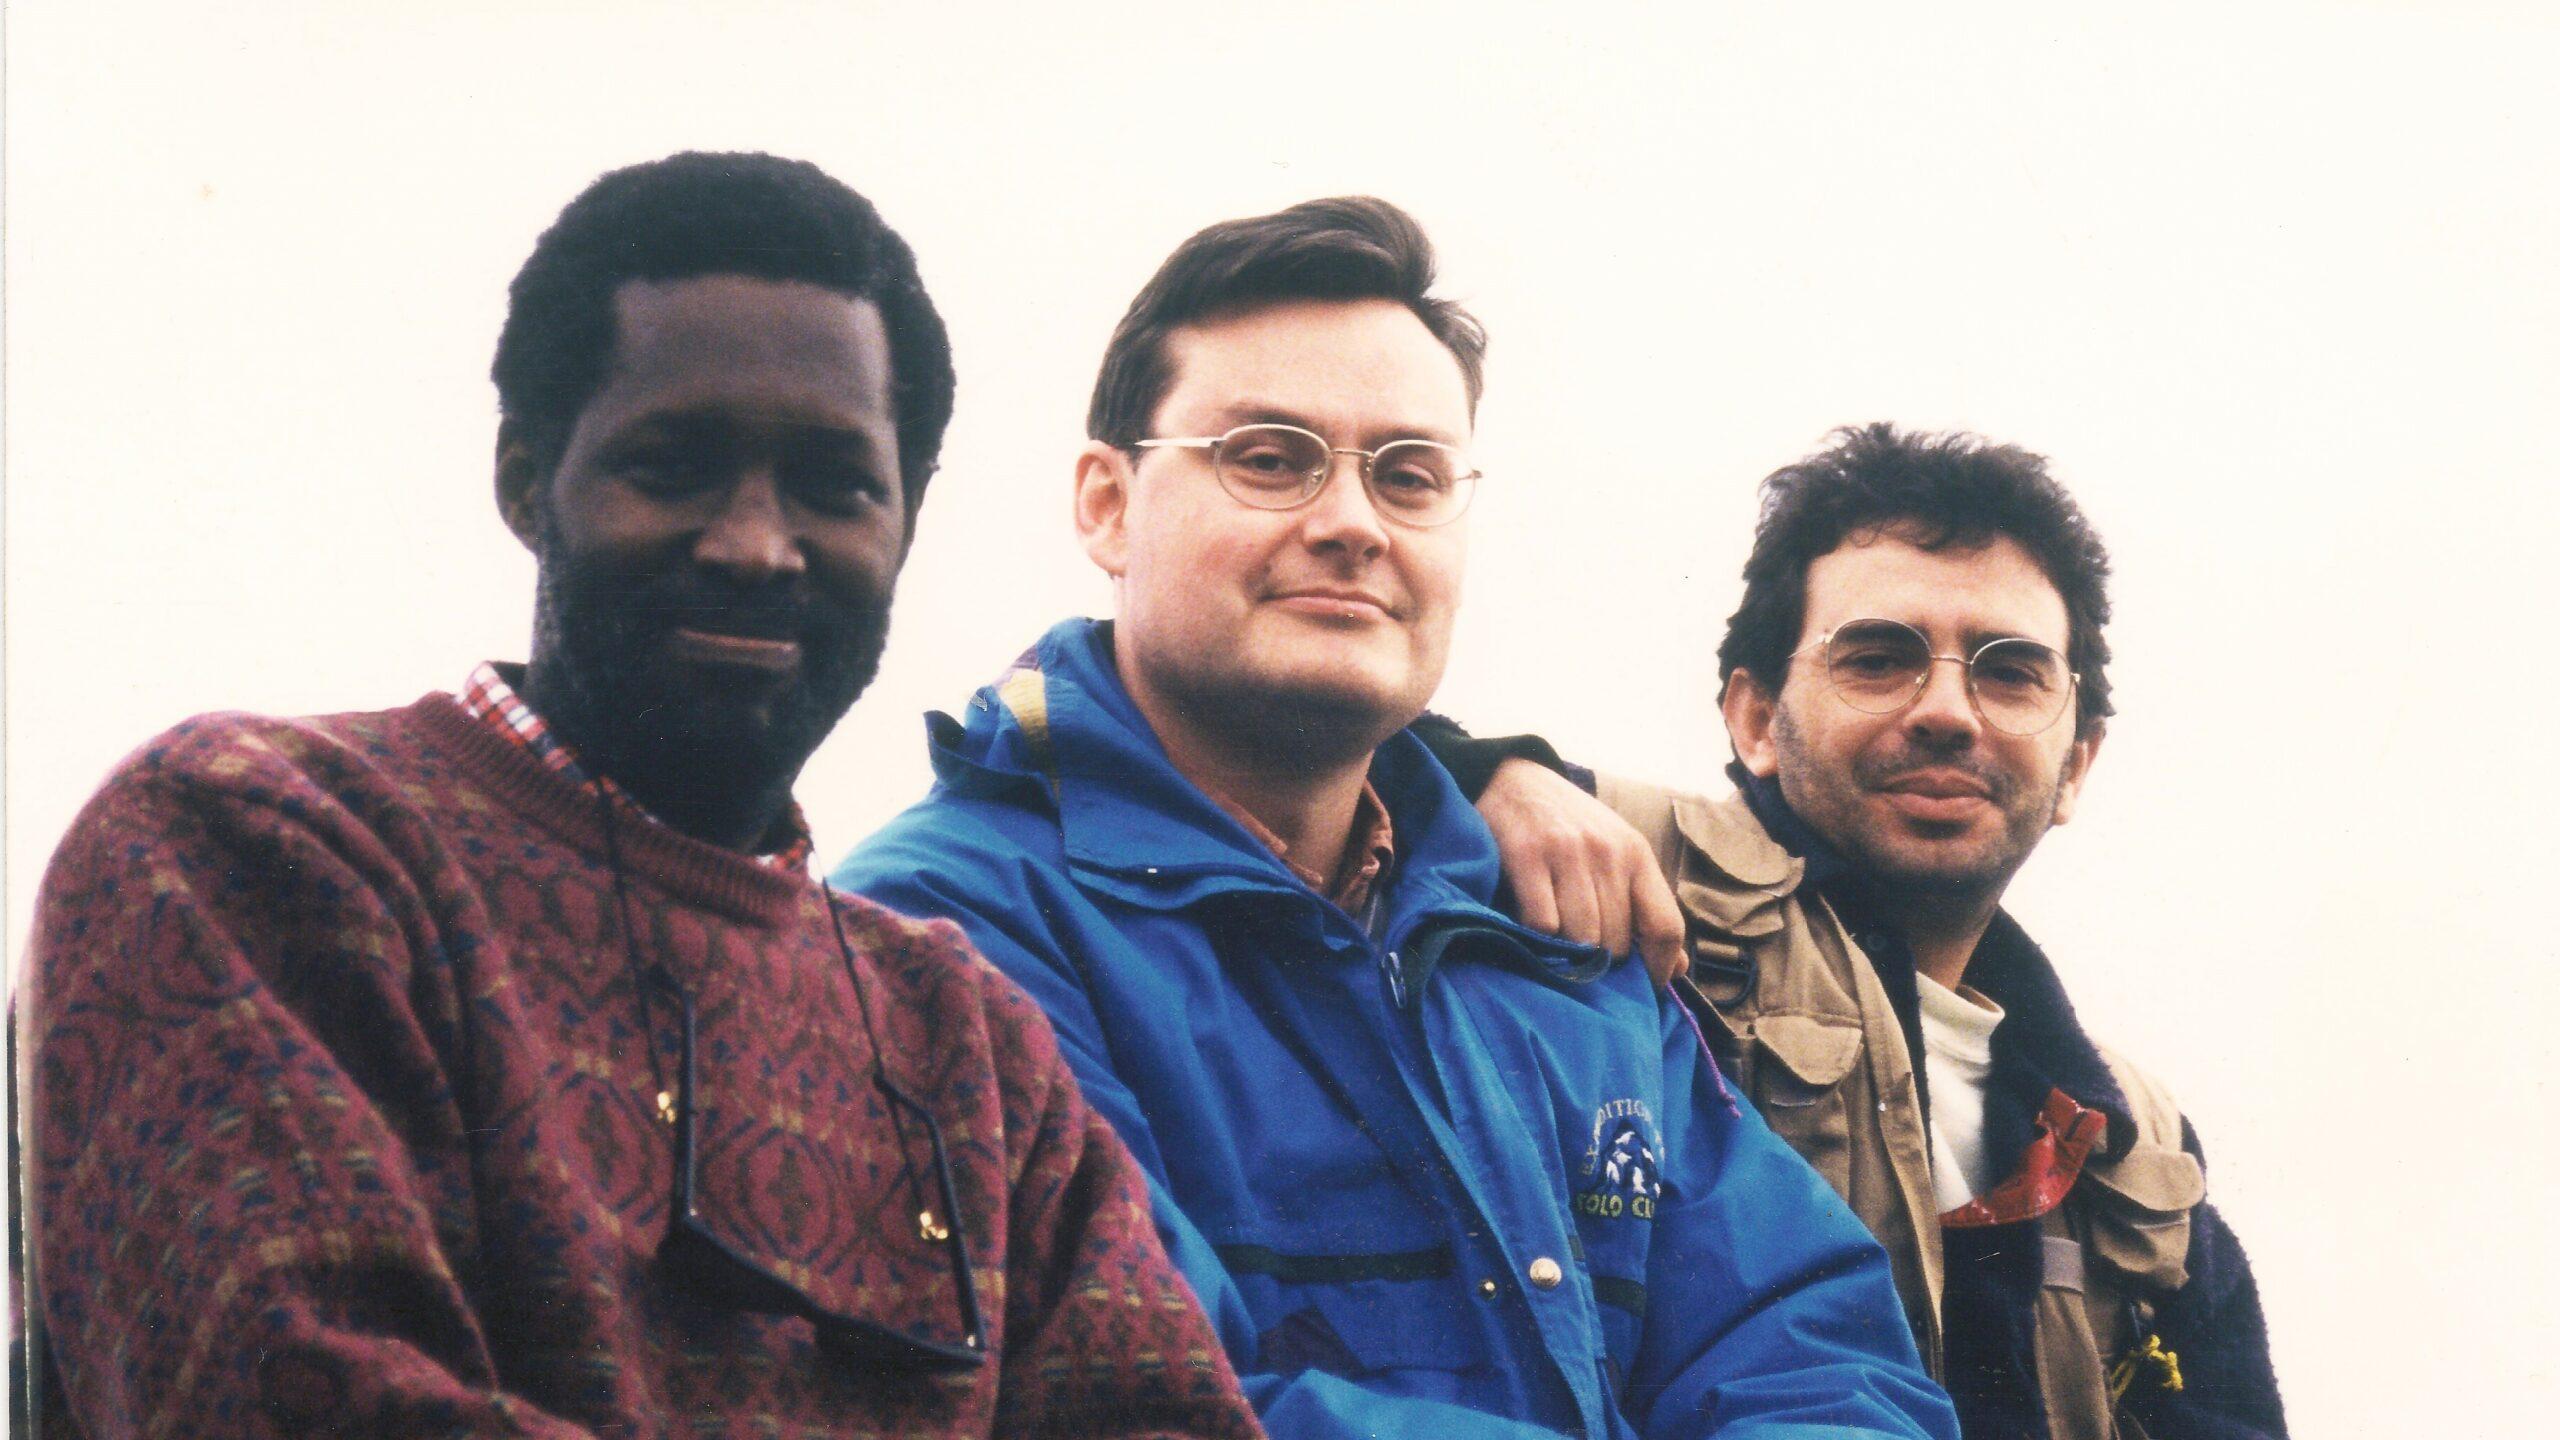 1996-Excursion S Nevada 1996